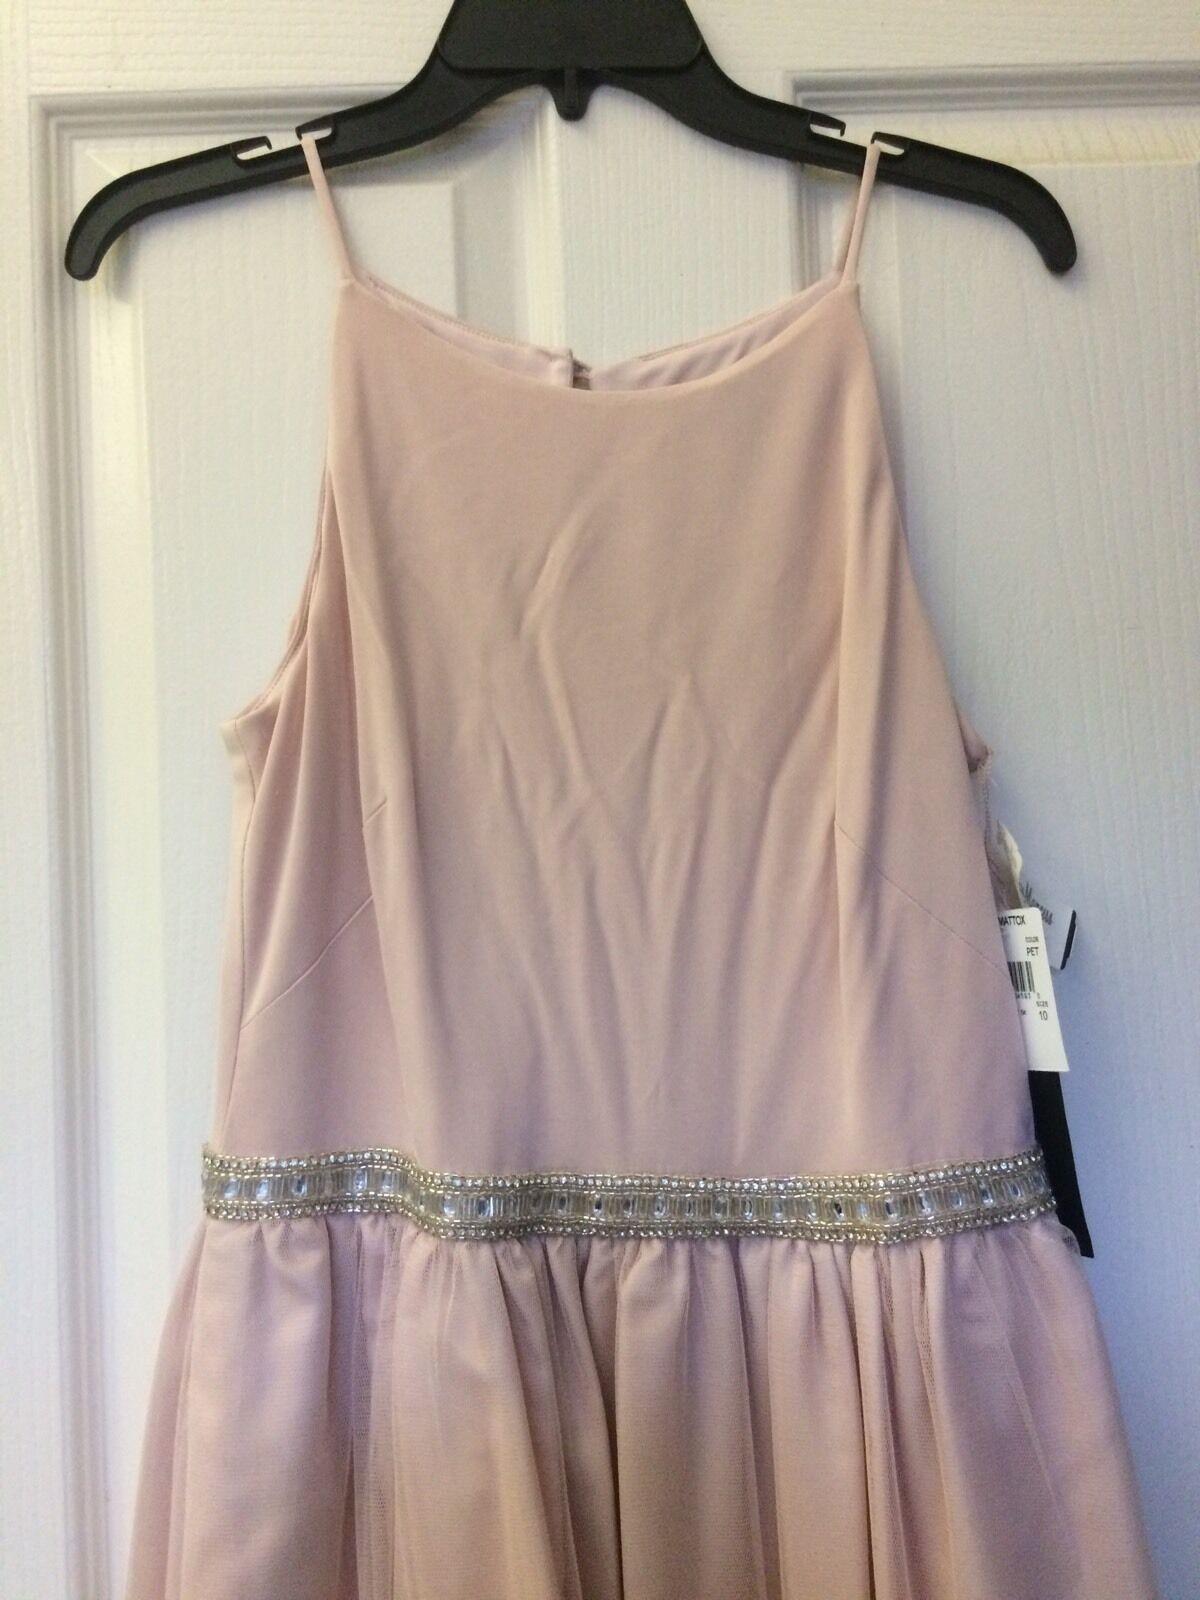 Aidan Mattox Gown dress In Size 10 bluesh